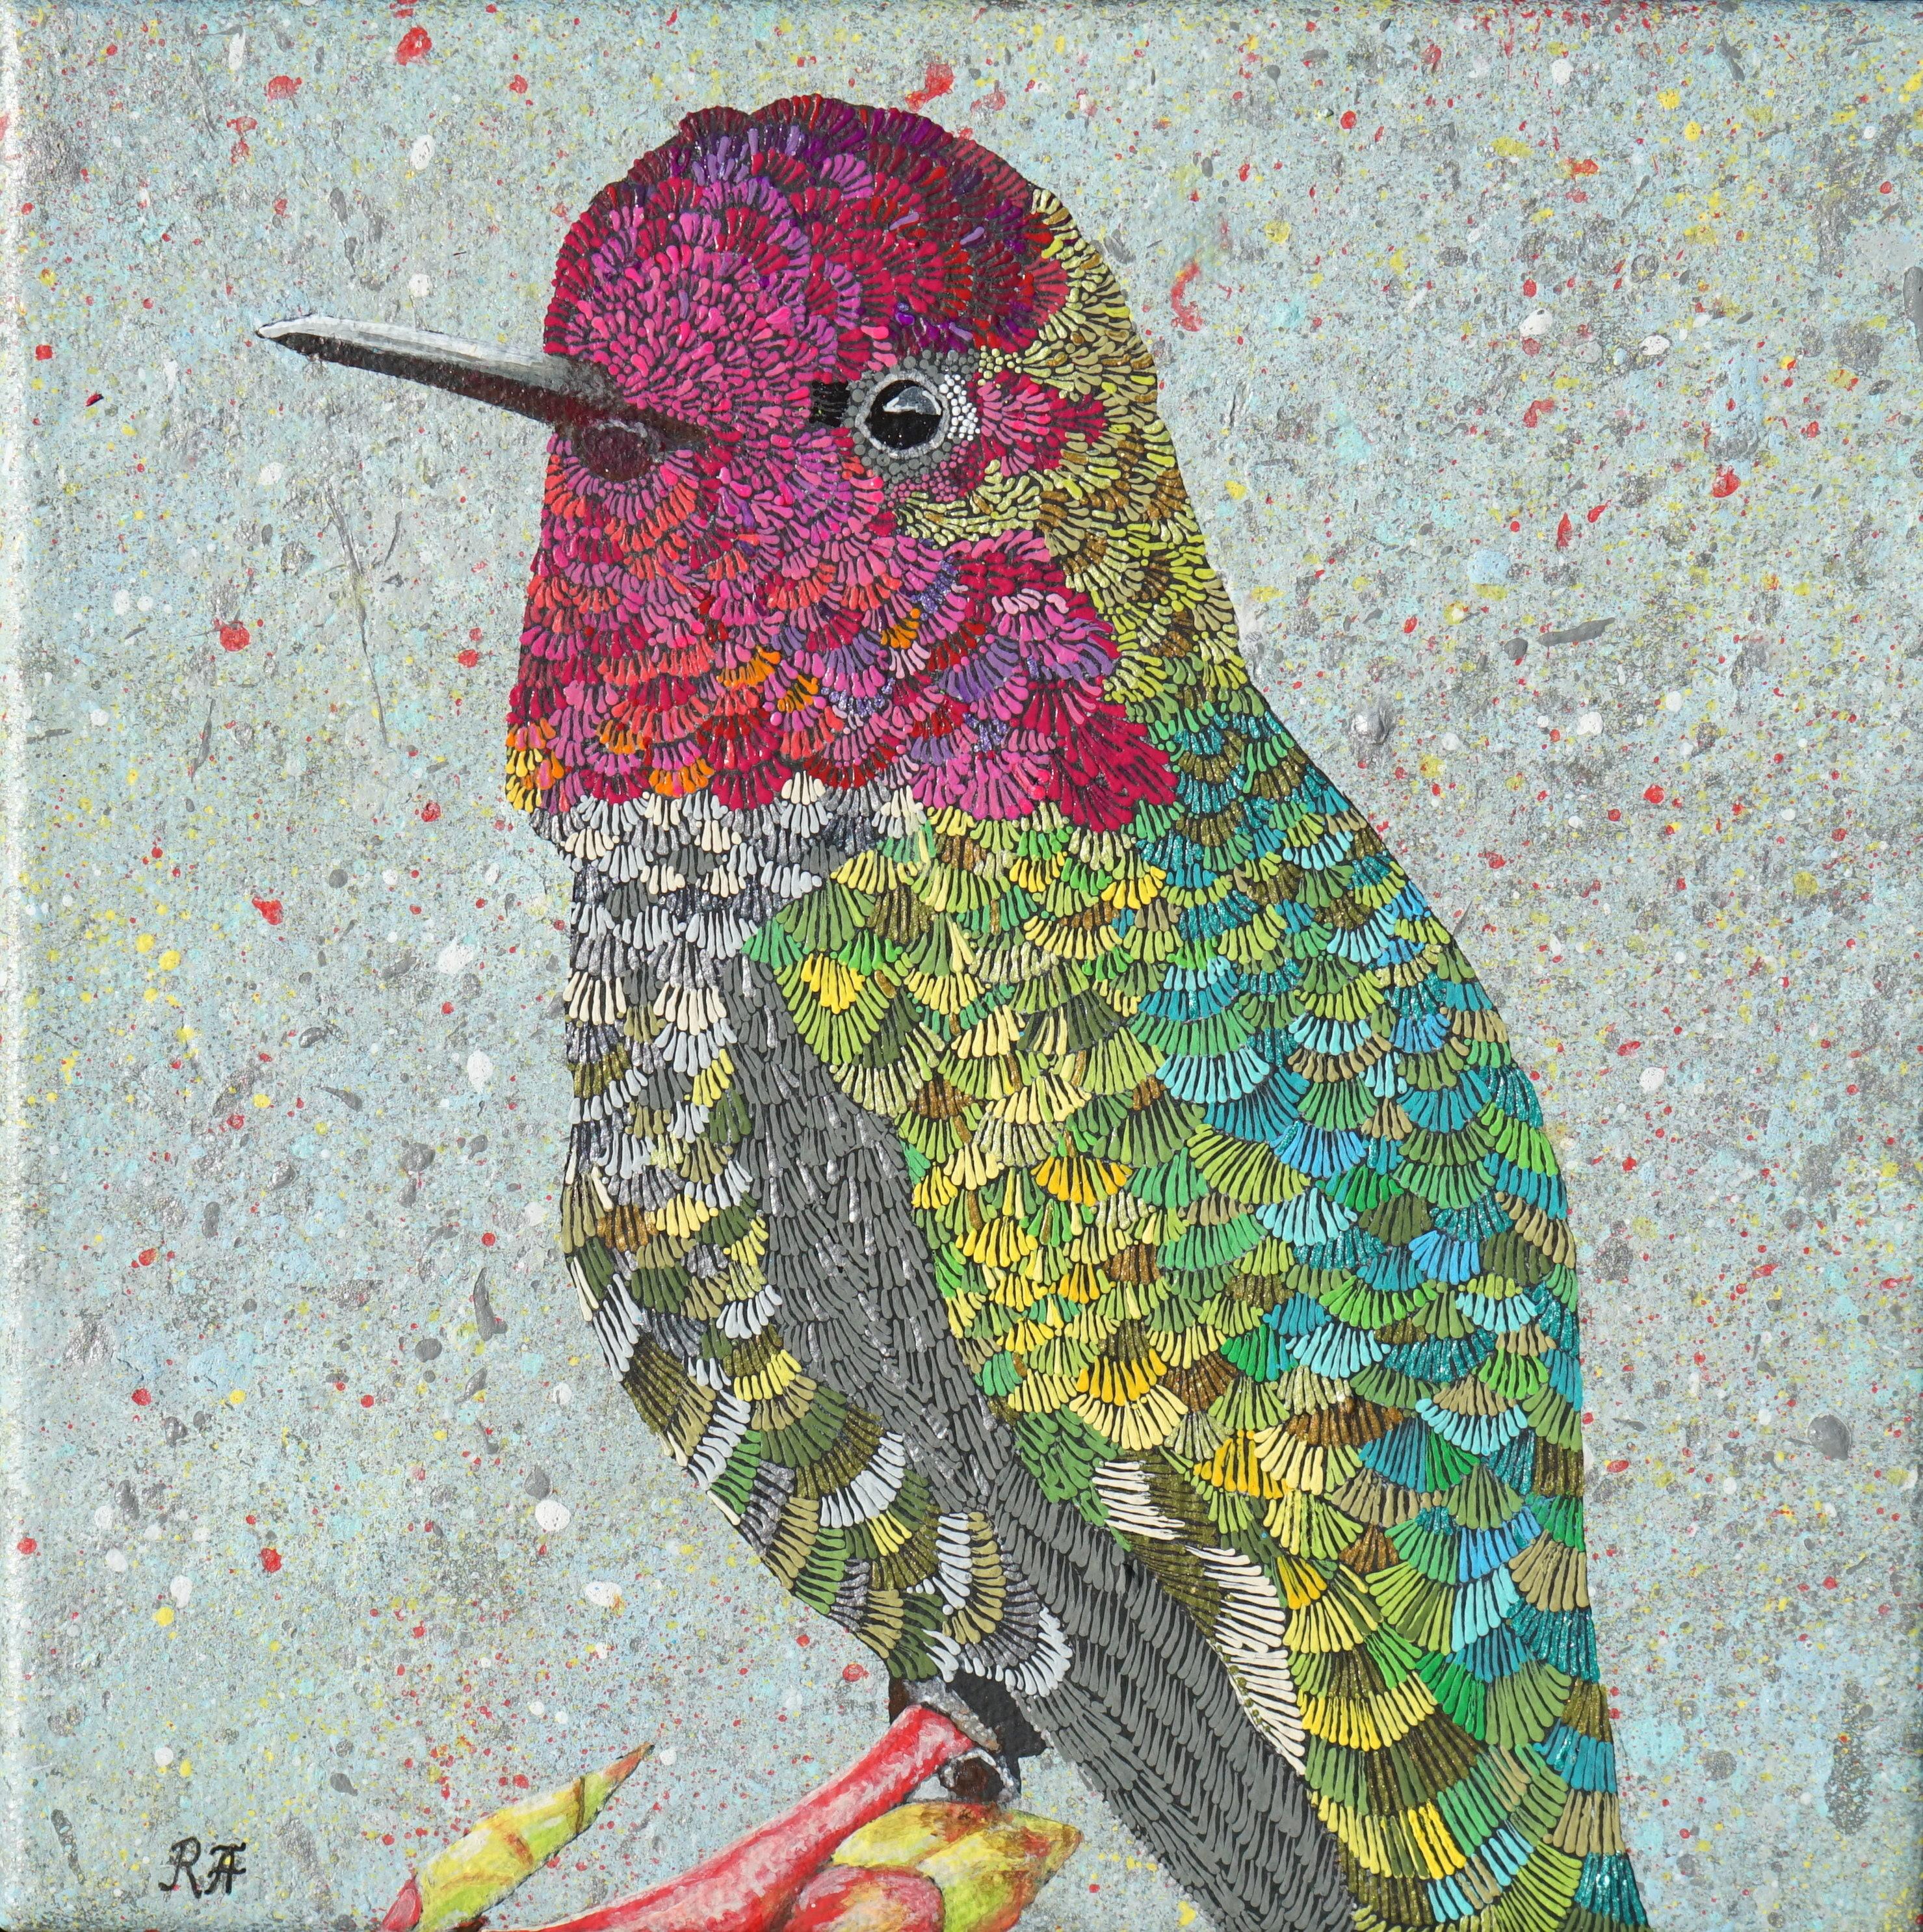 Kolibri Original Acryl-Gemälde auf Leinwand | Etsy